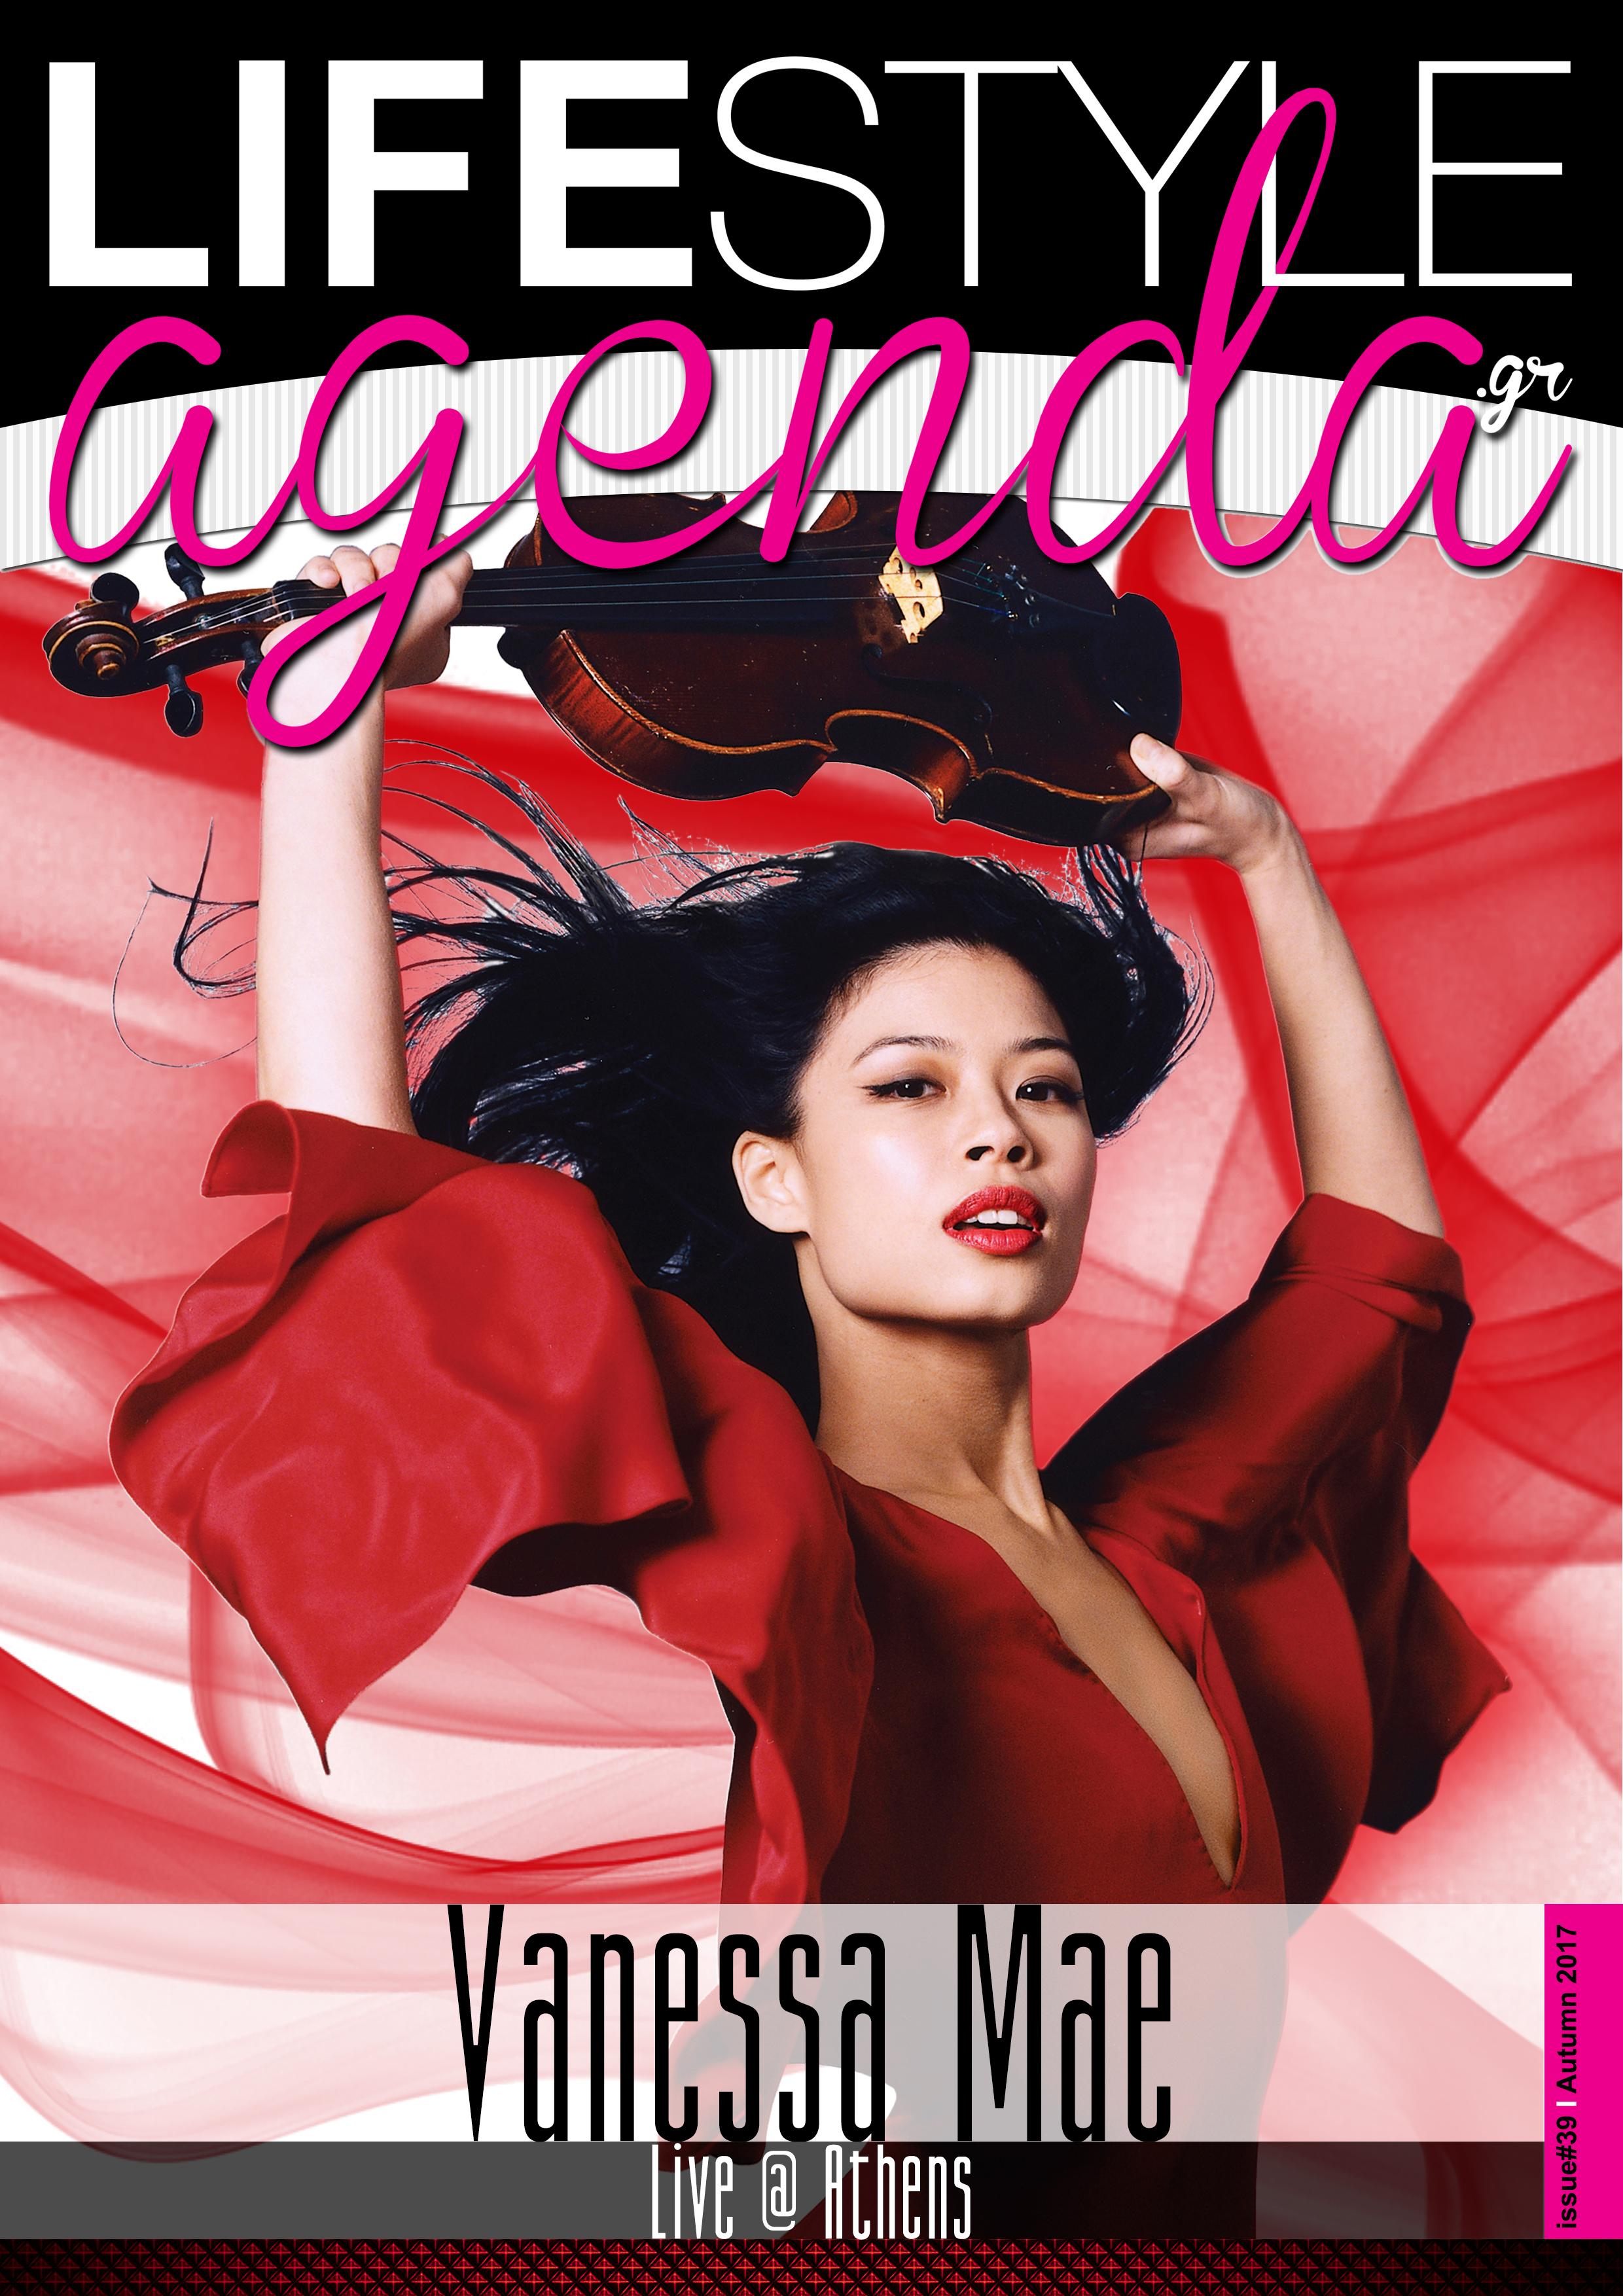 LifeStyle Agenda issue #39th / Magazine Cover by LifeStyleAgenda